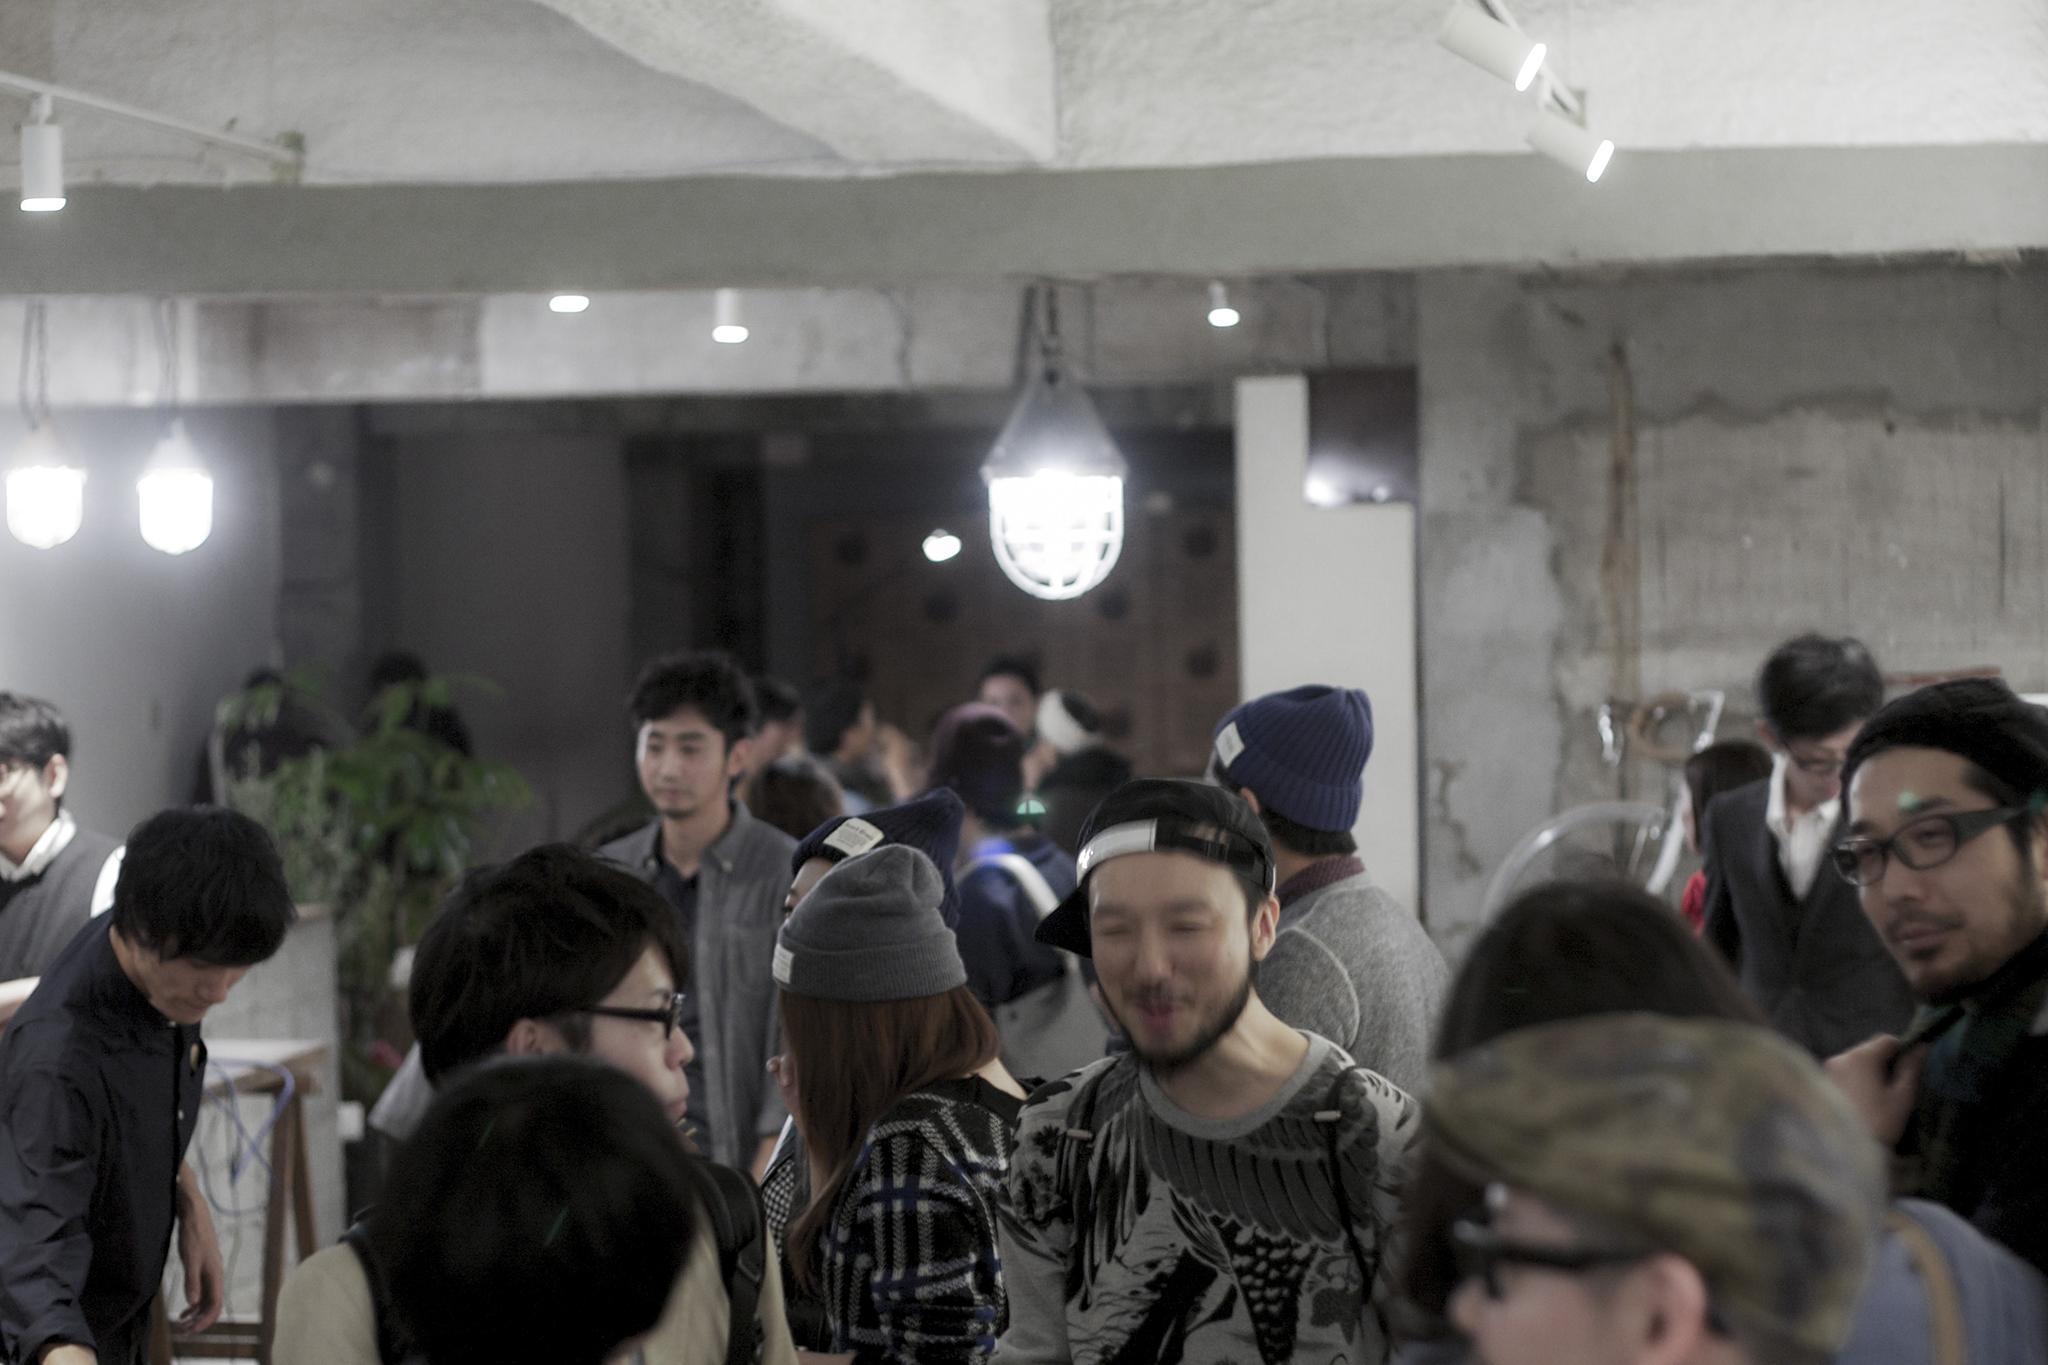 20141005_meet_reception_party43.jpg